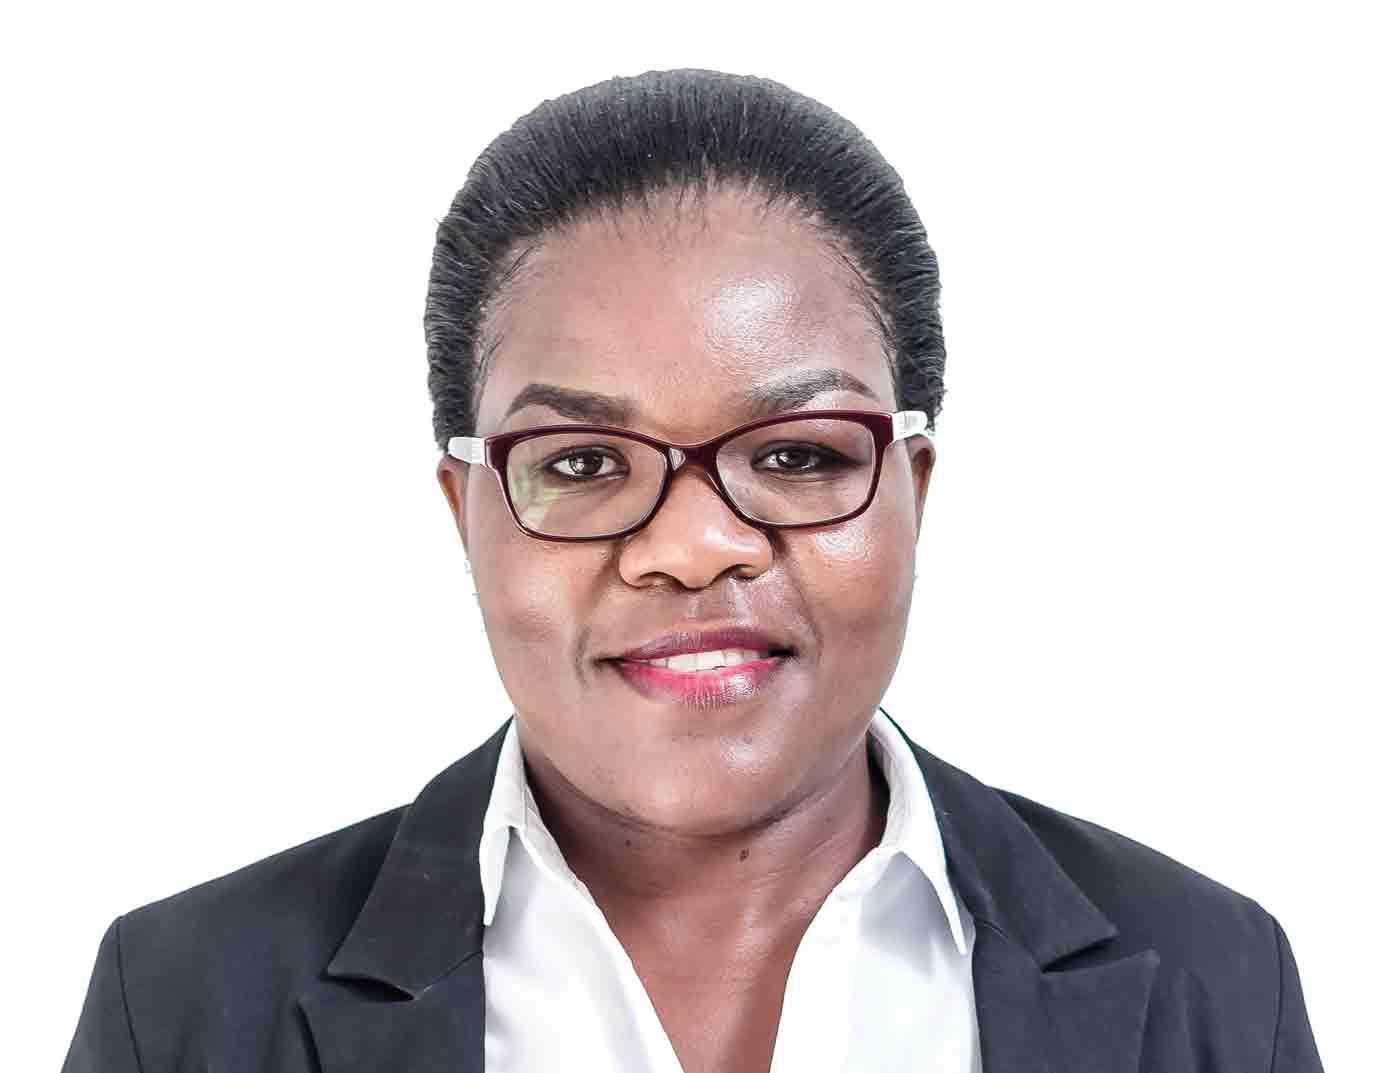 Mansweta-Joseph